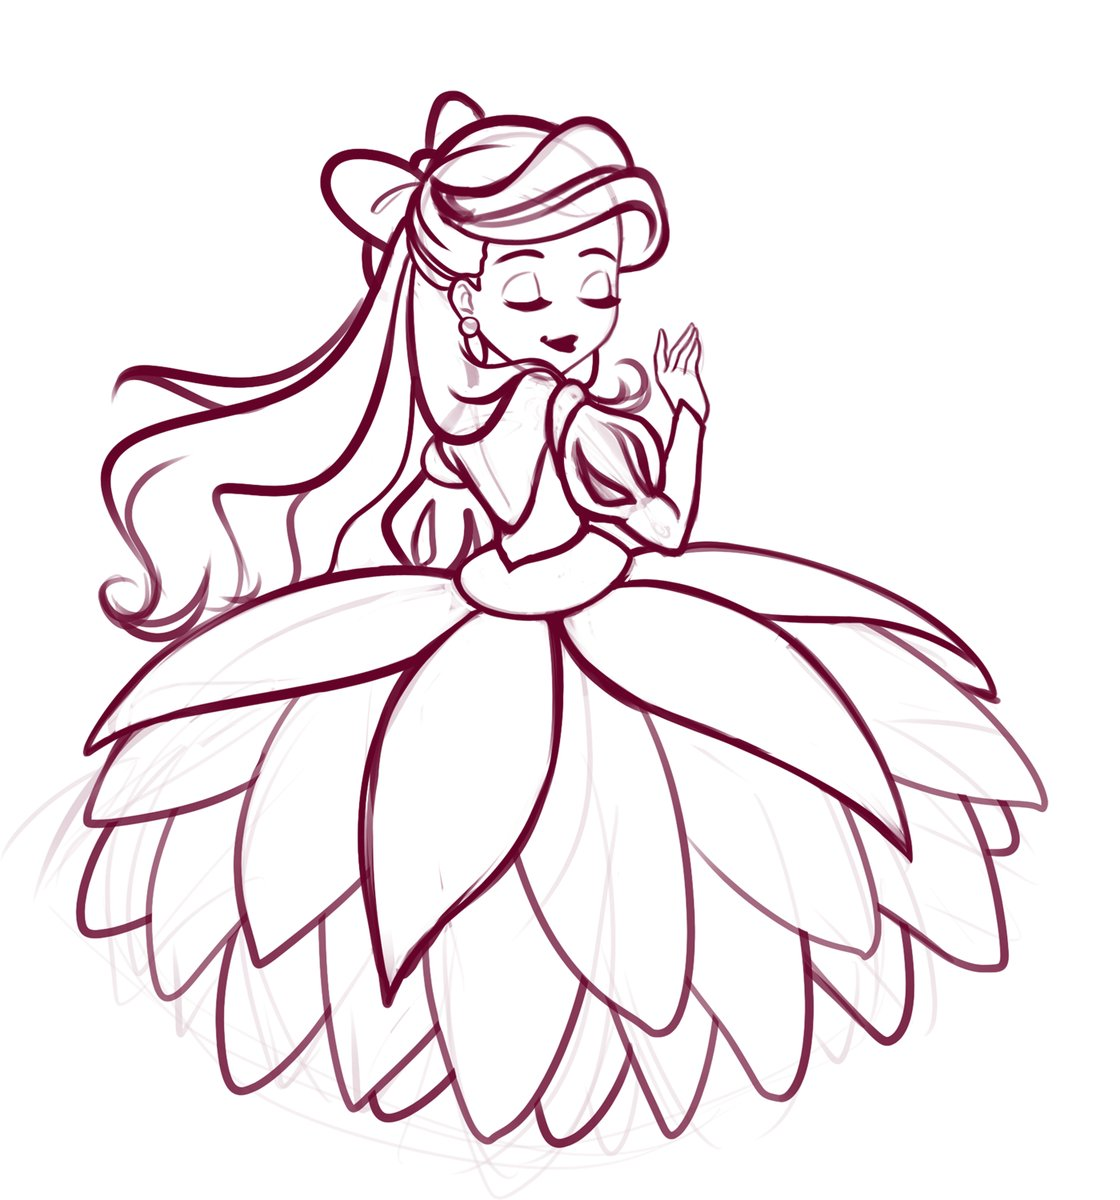 Drawing the next chibi princess #Ariel #thelittlemermaidpic.twitter.com/seExdbSh55